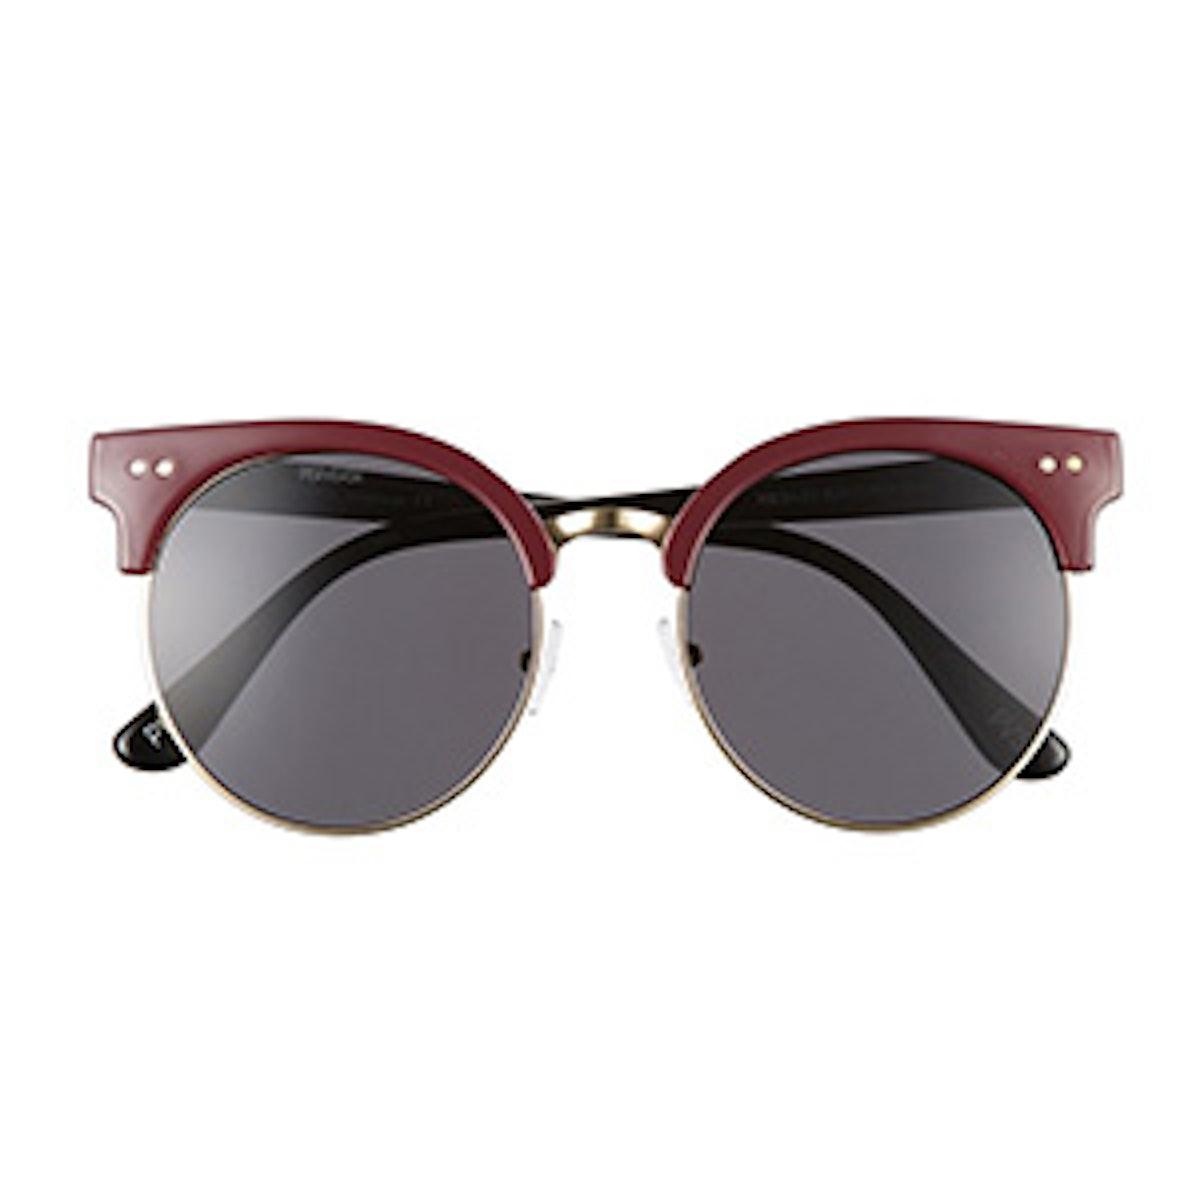 Fresh Sunglasses